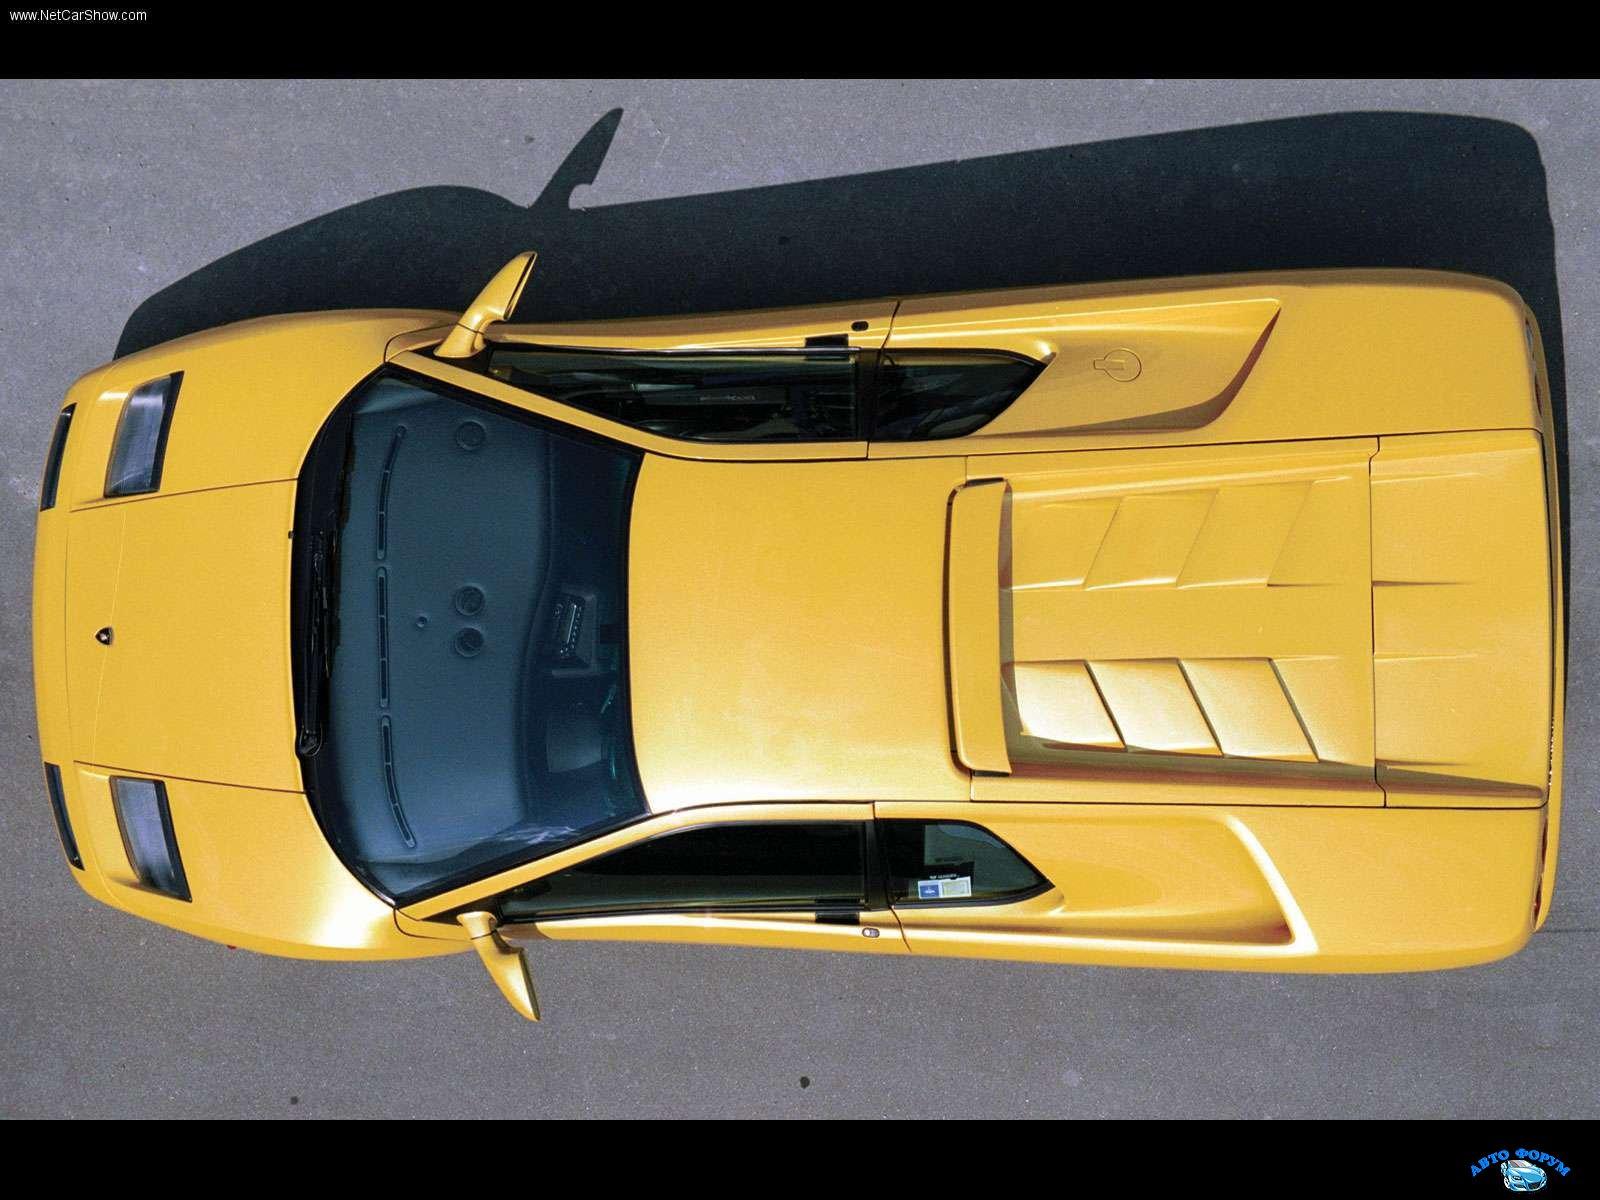 Lamborghini-Diablo_VT_1993_1600x1200_wallpaper_07.jpg